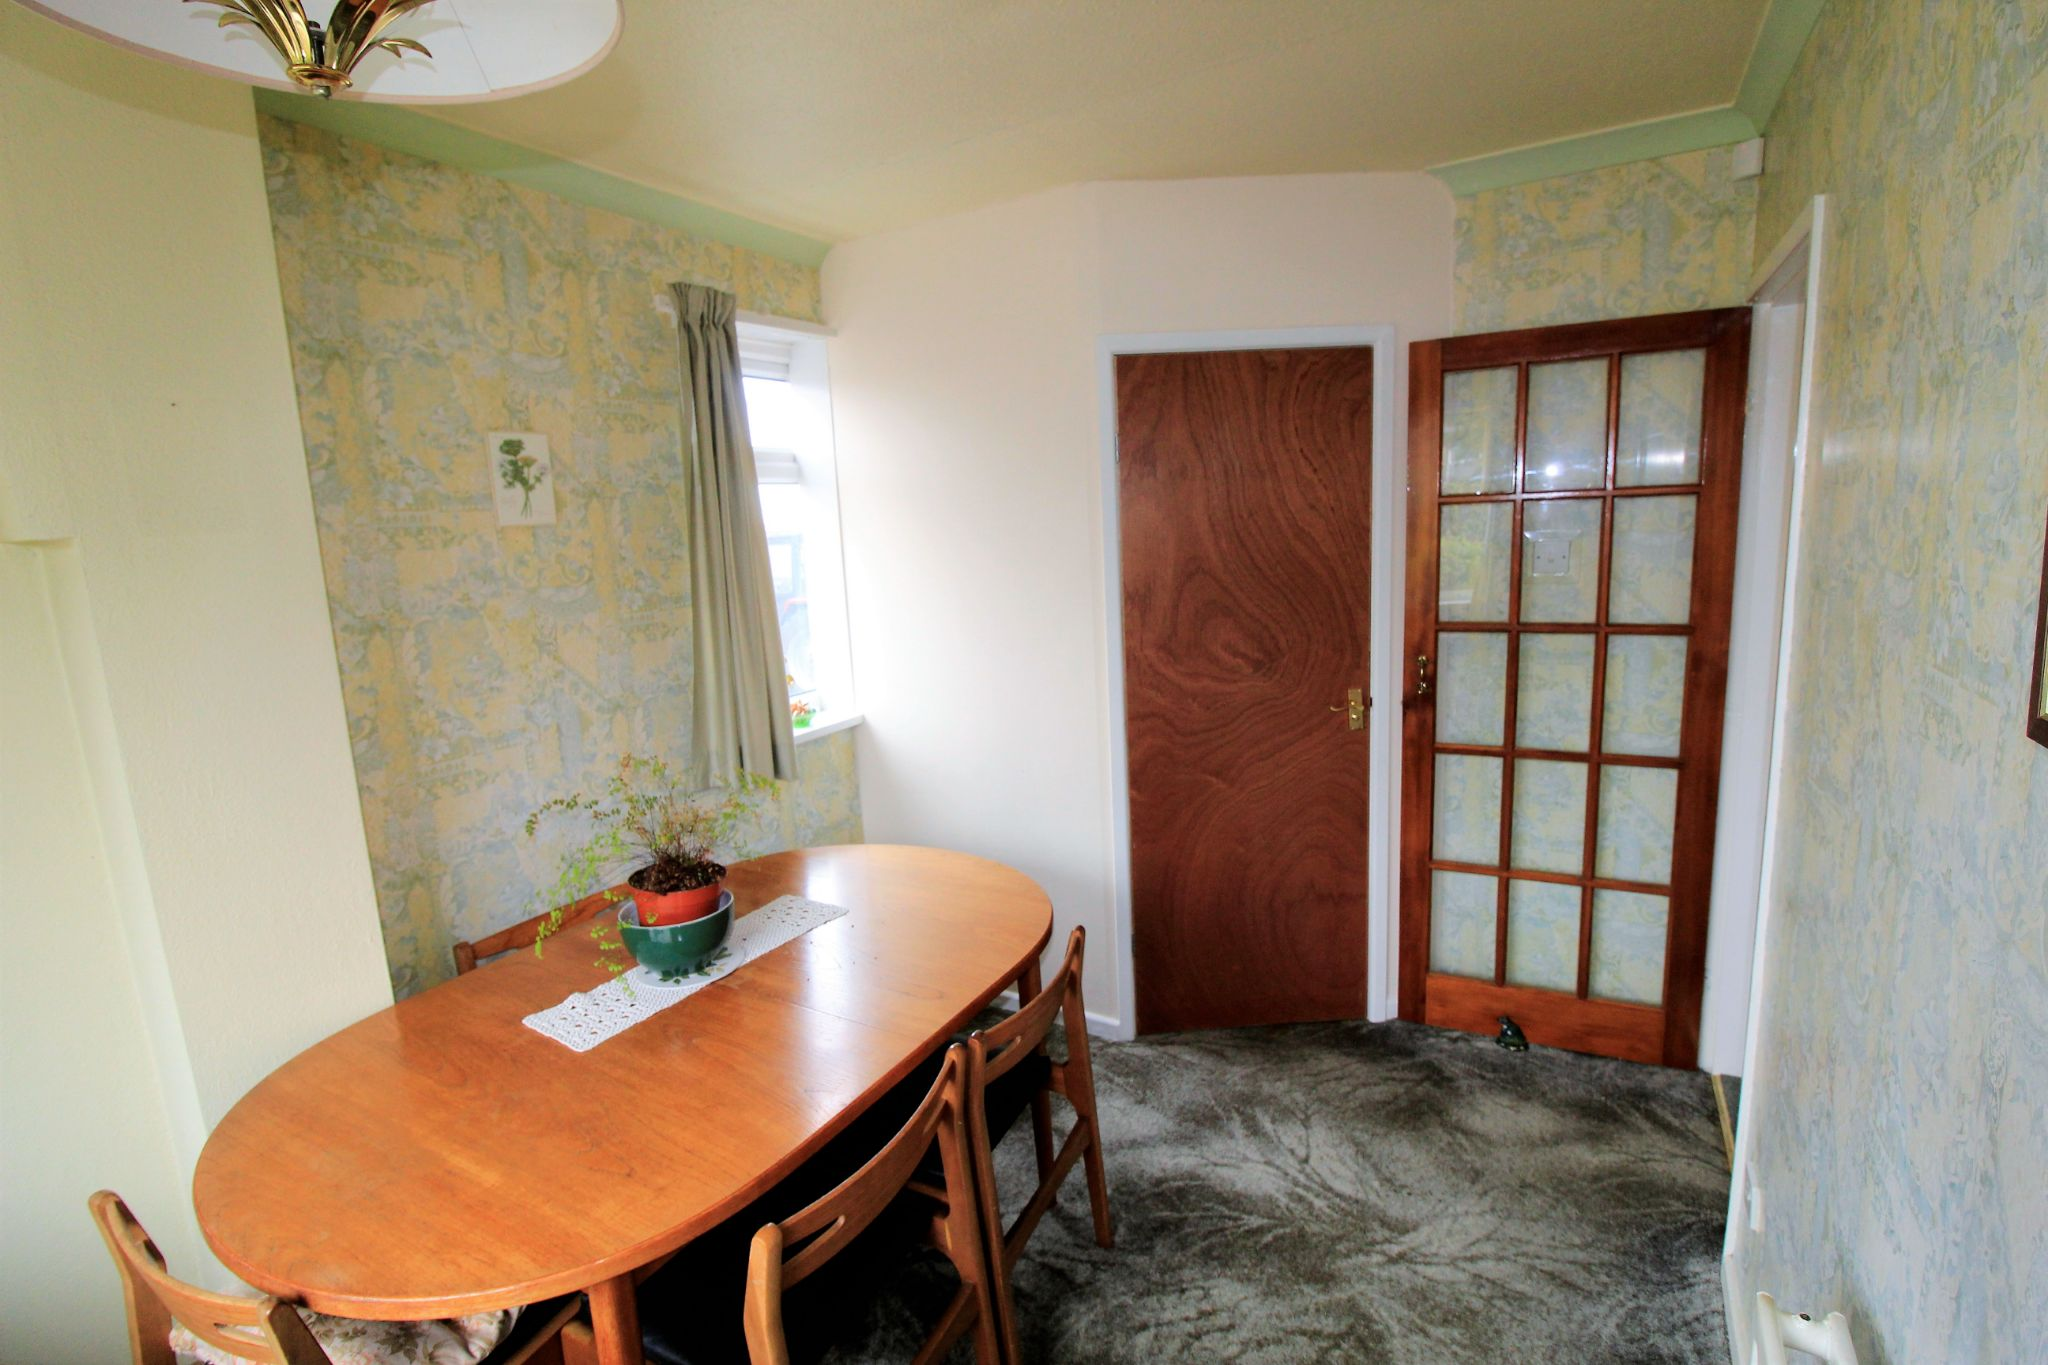 2 bedroom semi-detached bungalow SSTC in Bradford - Dining Room